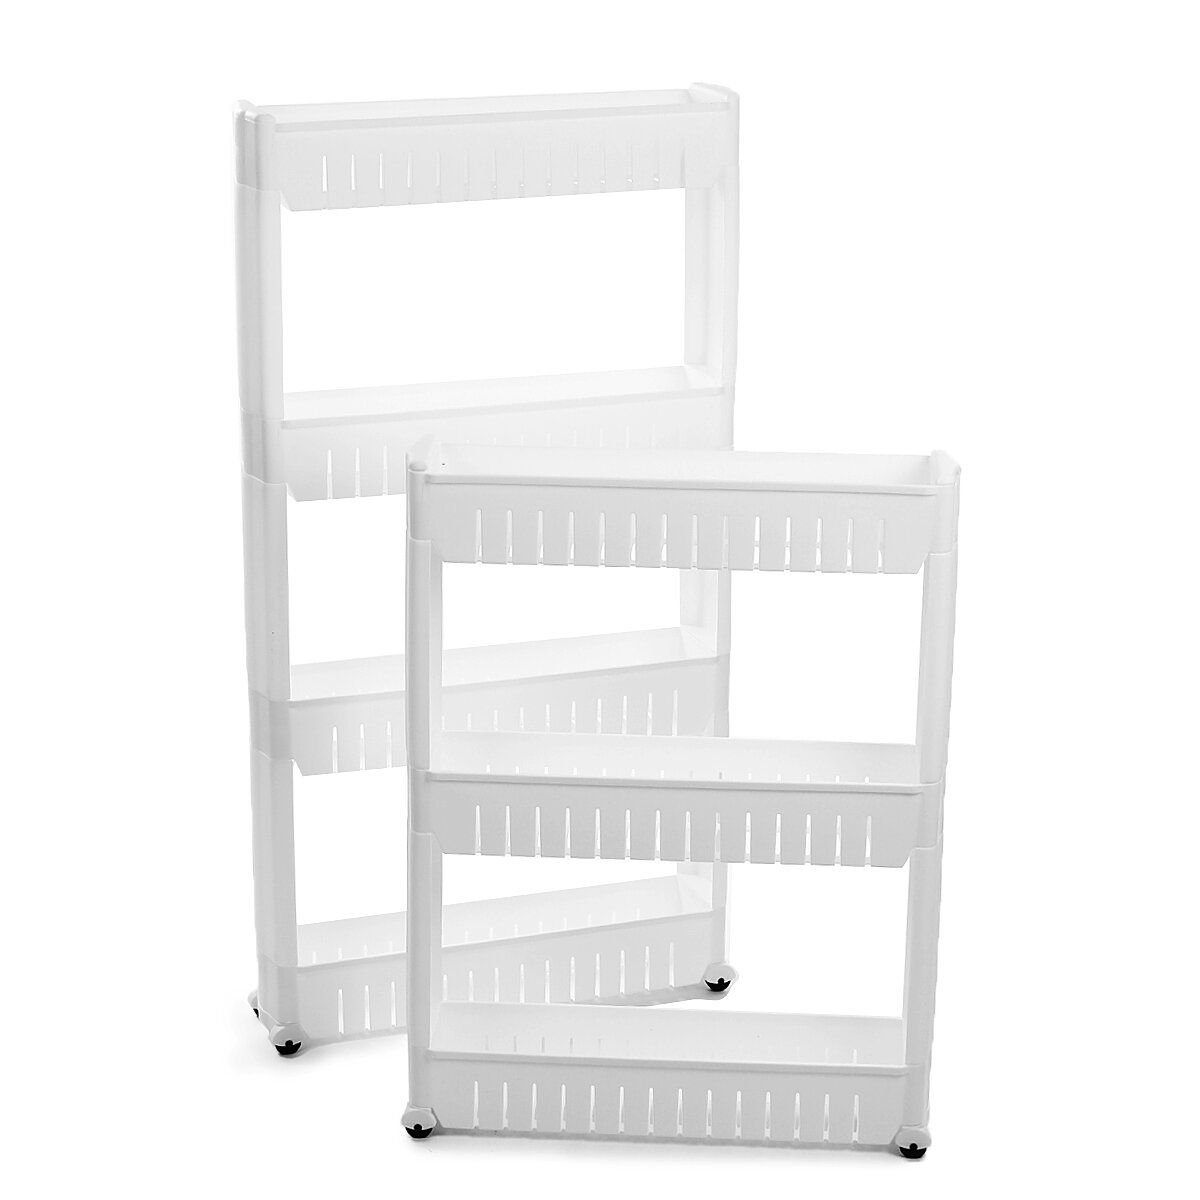 Slim Slide Out Trolley Rack Holder Storage Shelf Organiser on Wheels Kitchen Office